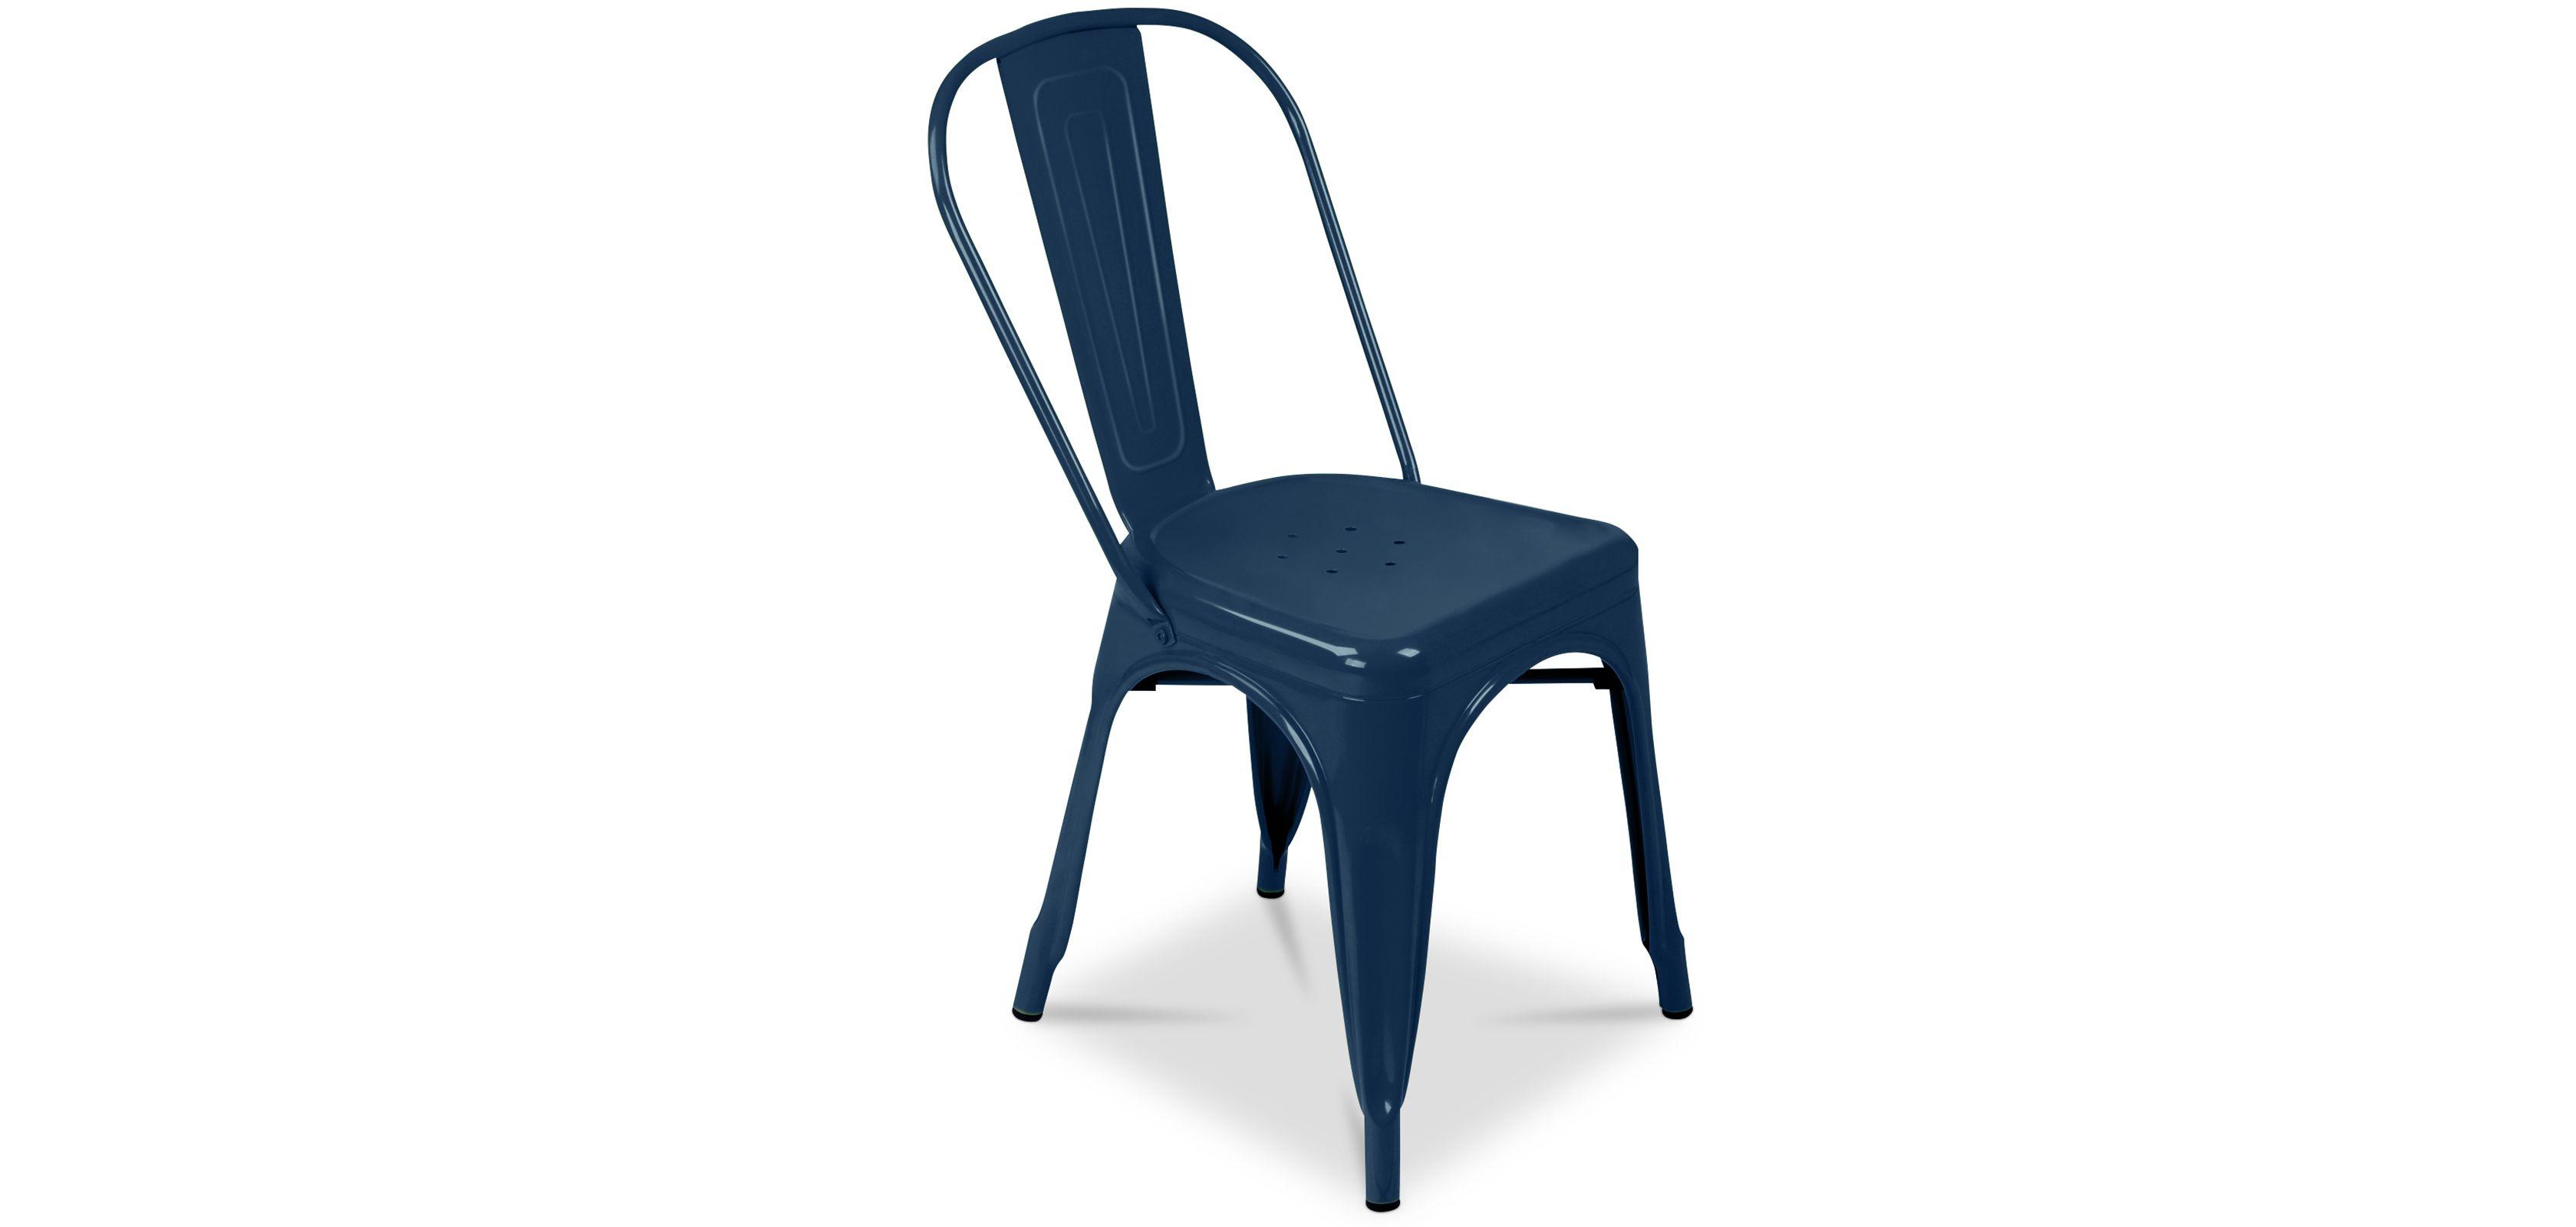 Chaise Tolix Xavier Pauchard Style Metal Tolix Chair Metal